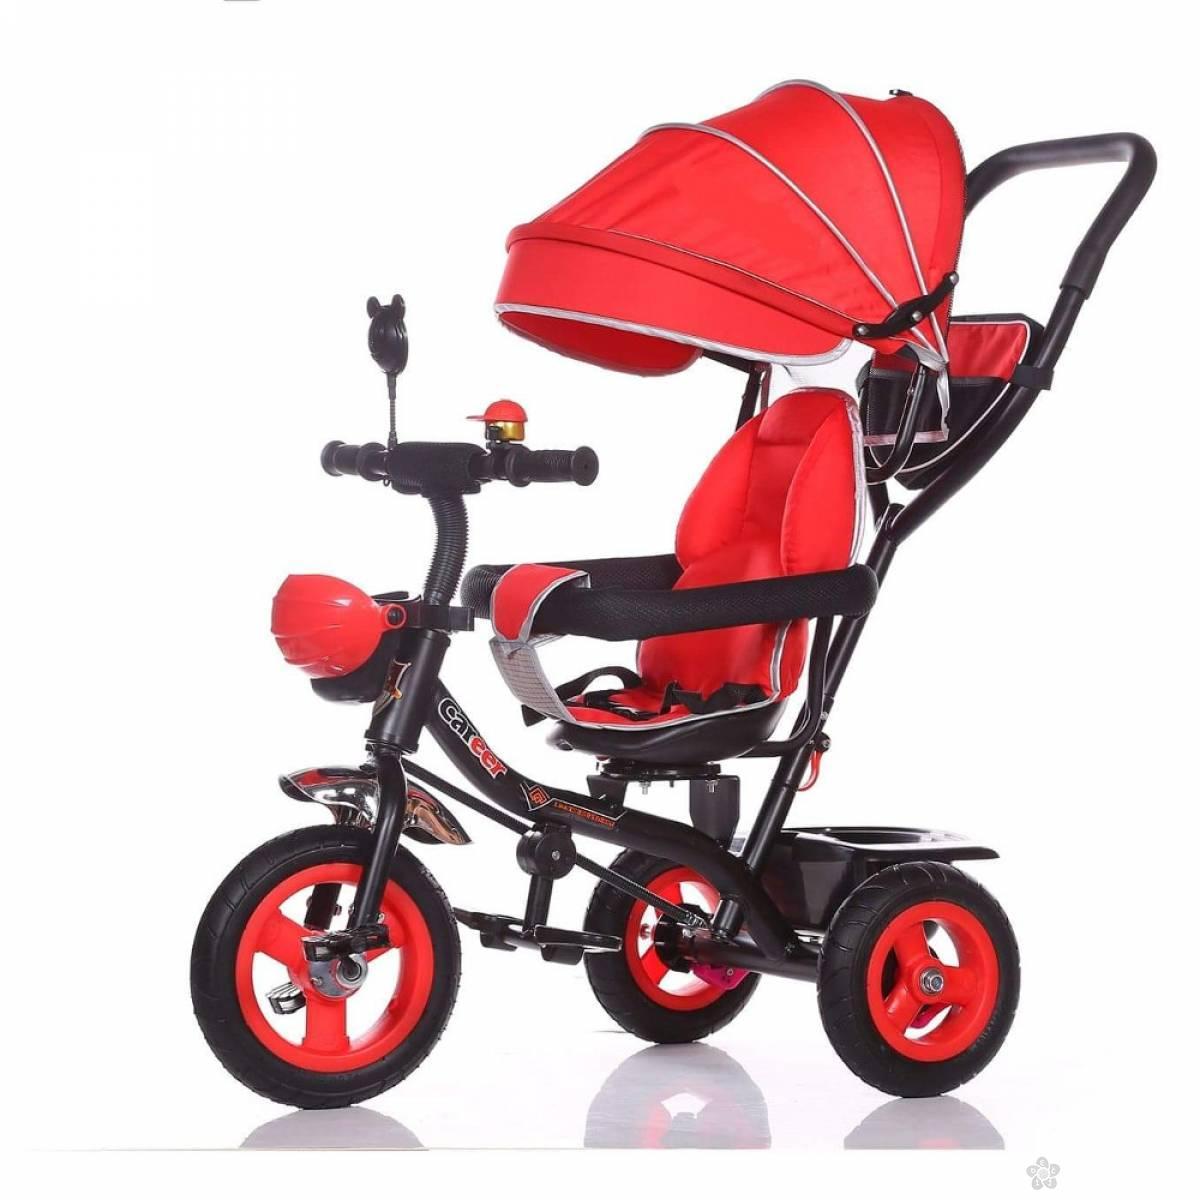 Tricikl sa korpom i tendom BYT066-9, crveni